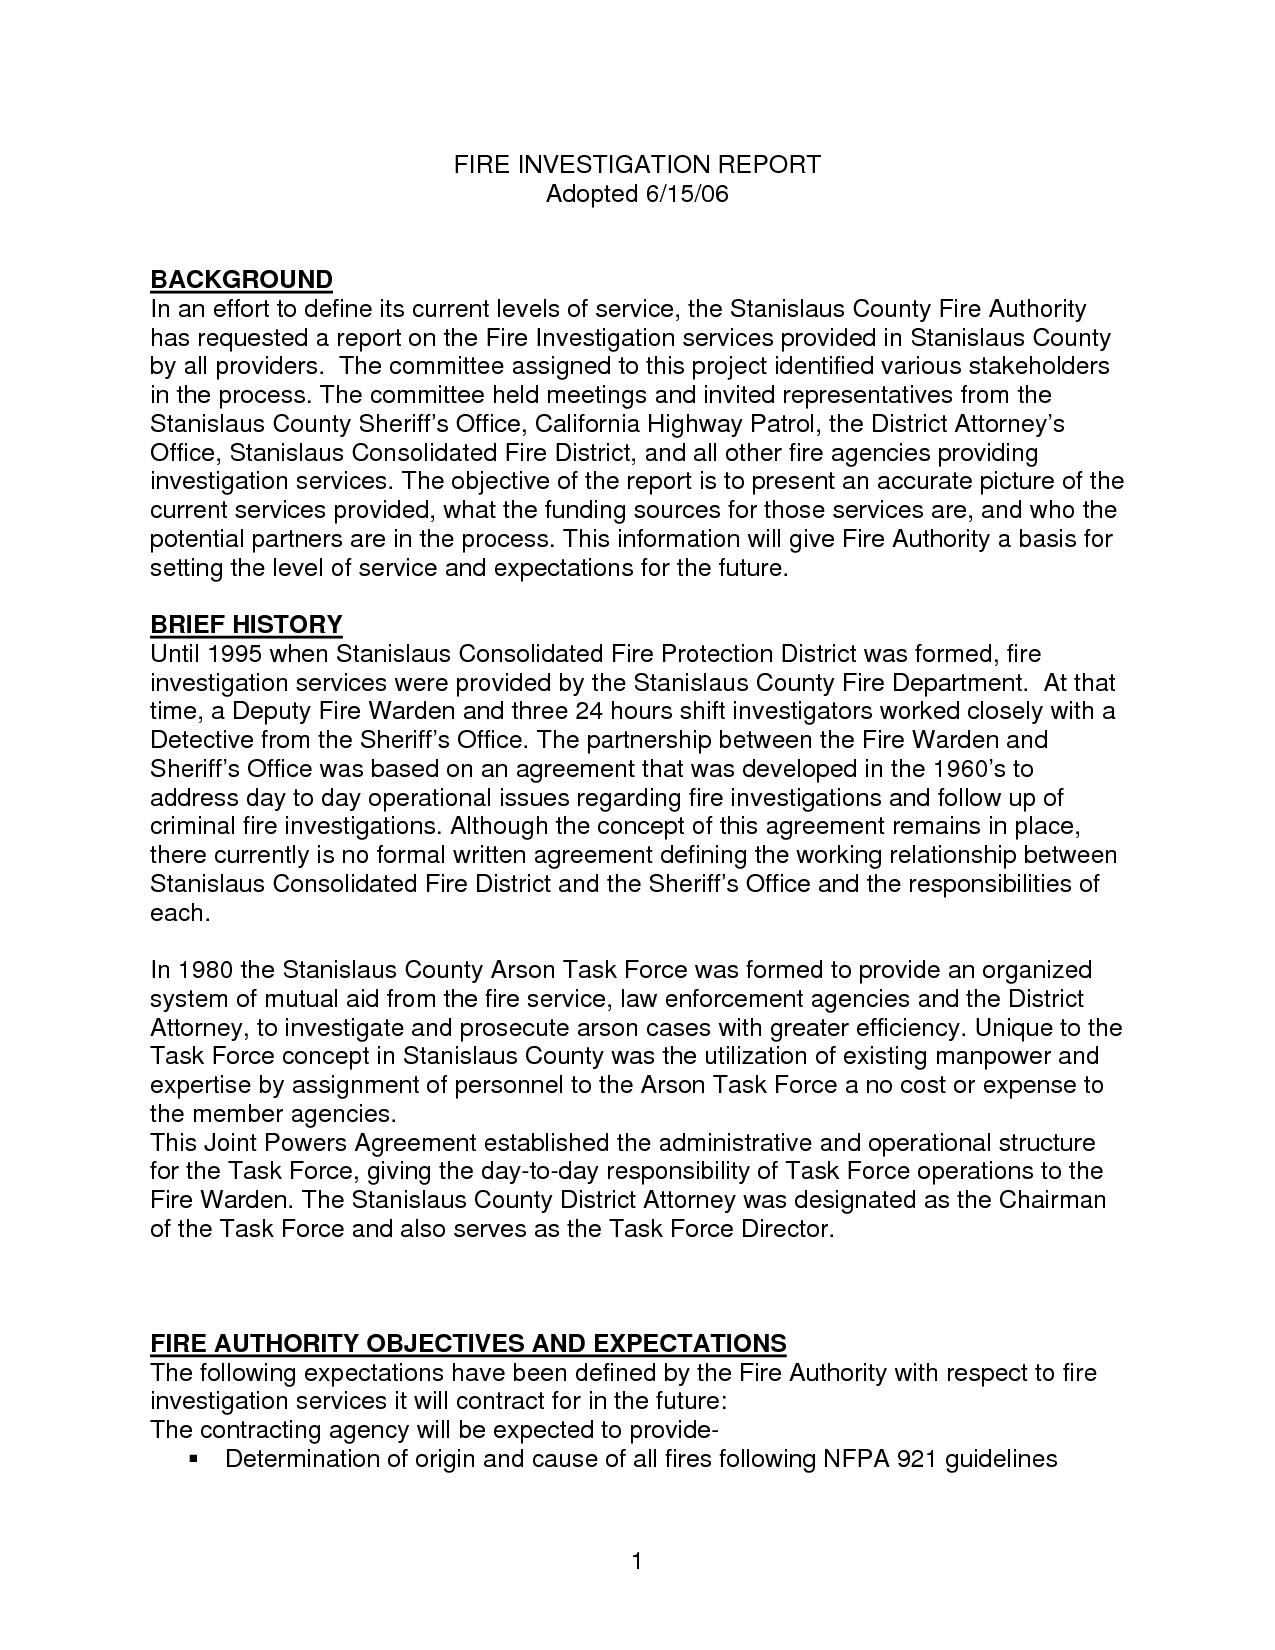 Sample Fire Investigation Report Template  Cablomongroundsapexco Inside Sample Fire Investigation Report Template